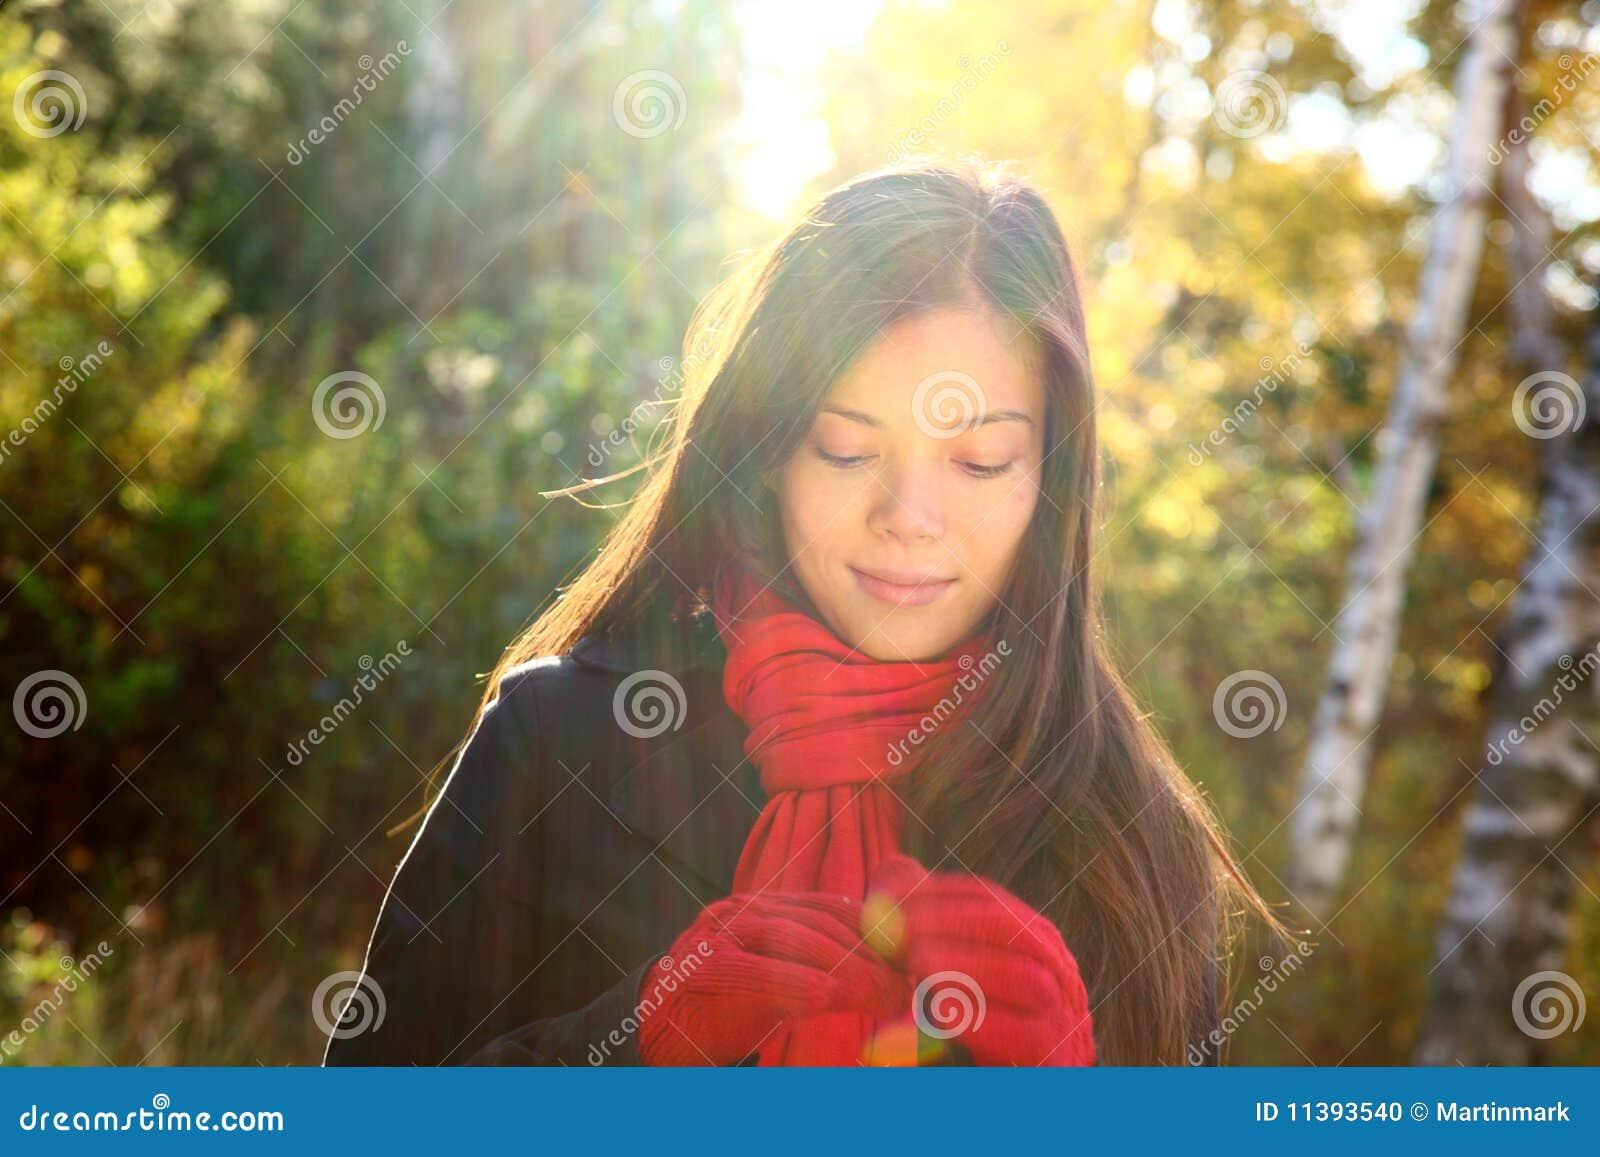 Fall / autumn woman daydreaming